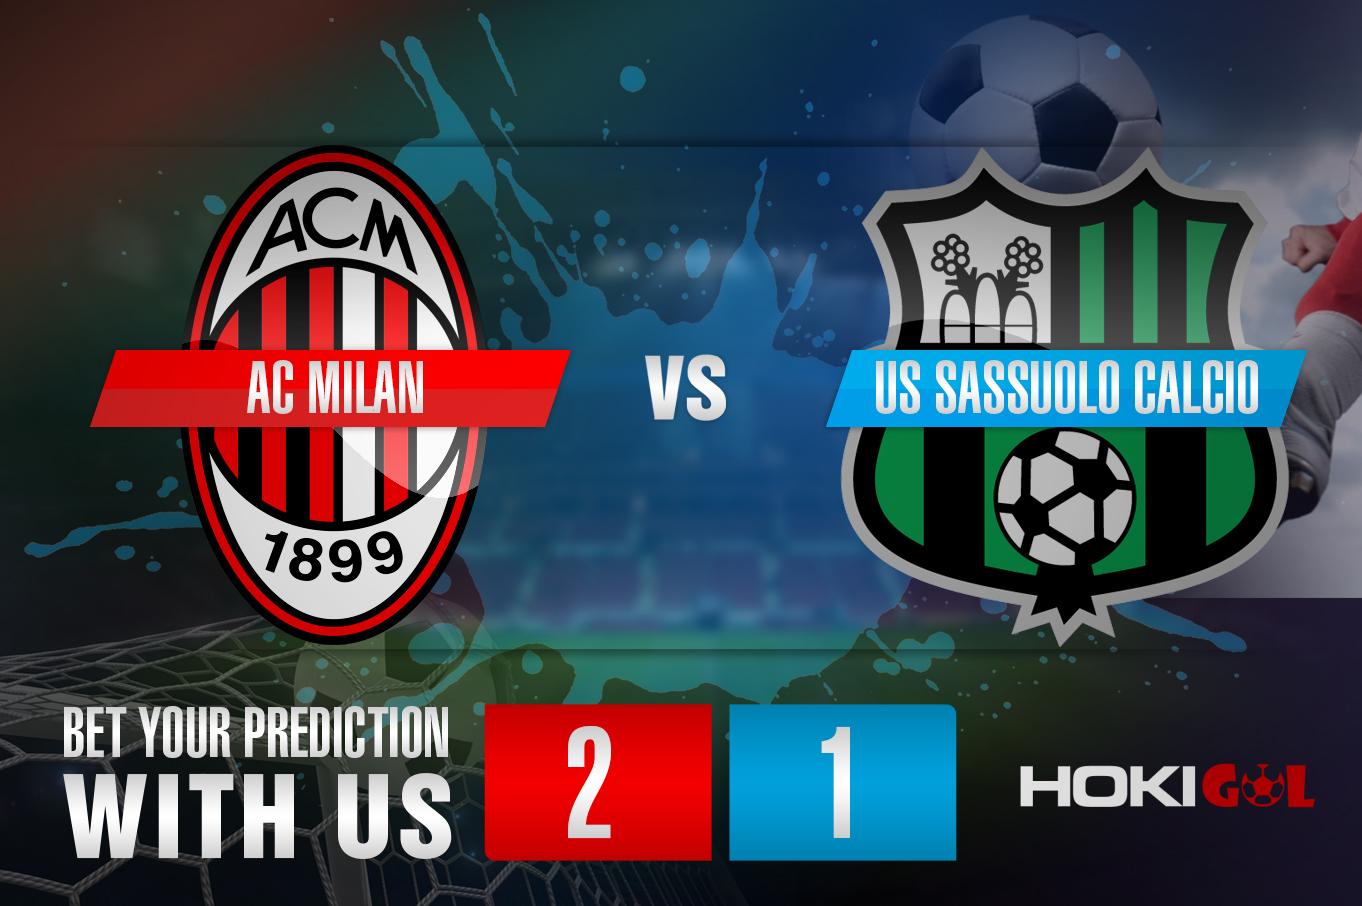 Prediksi Bola AC Milan Vs US Sassuolo Calcio 21 April 2021